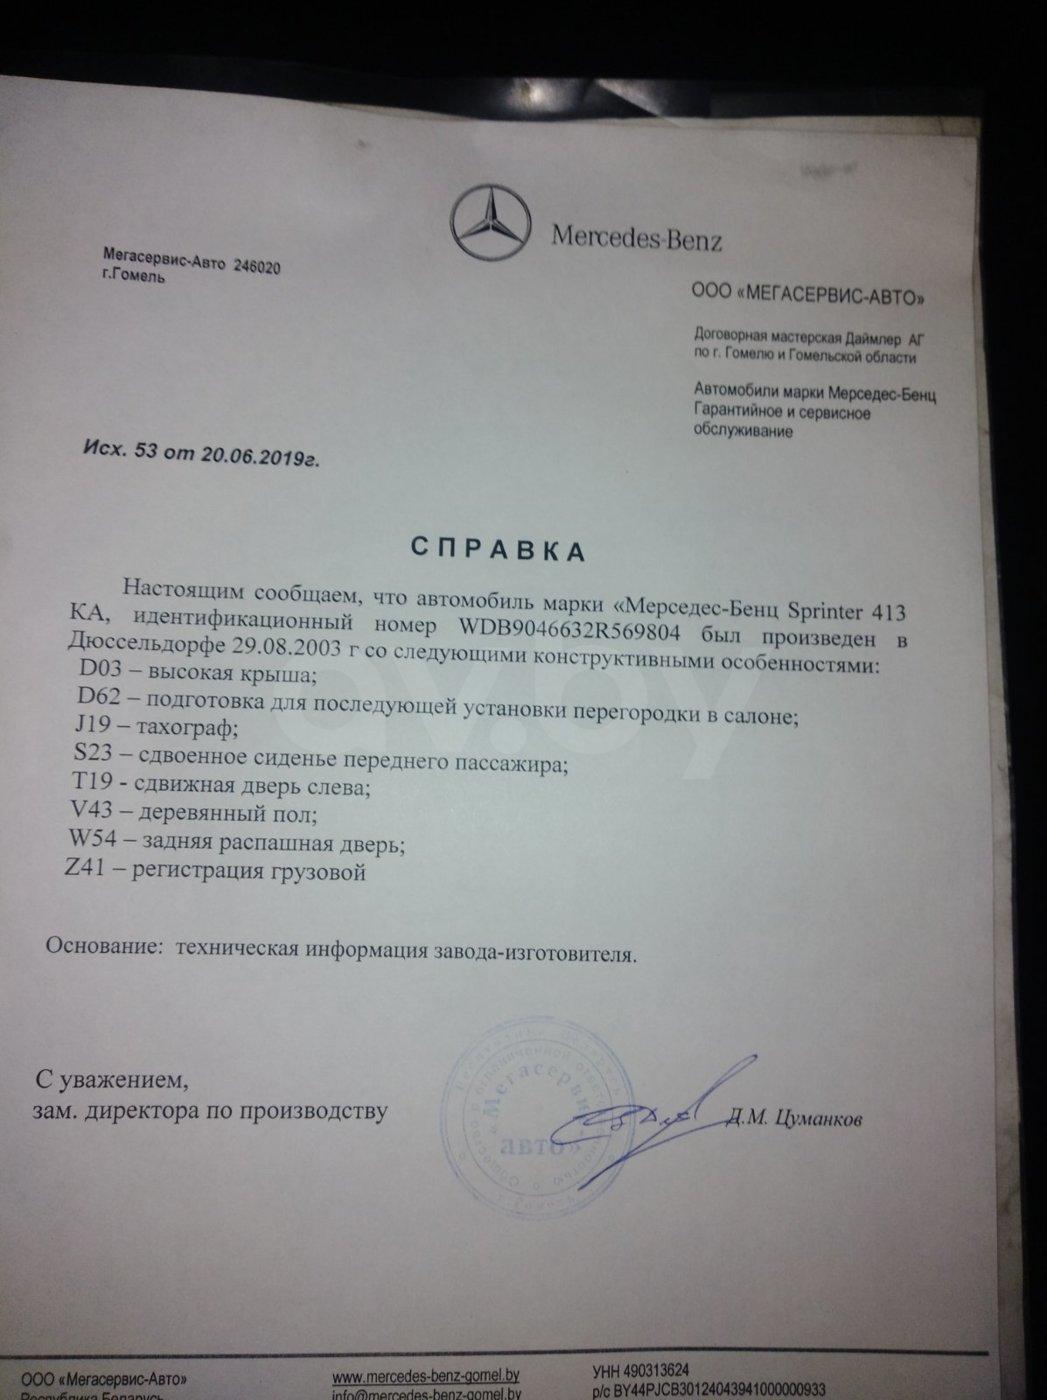 Mercedes-Benz Sprinter 413, 2003 г.